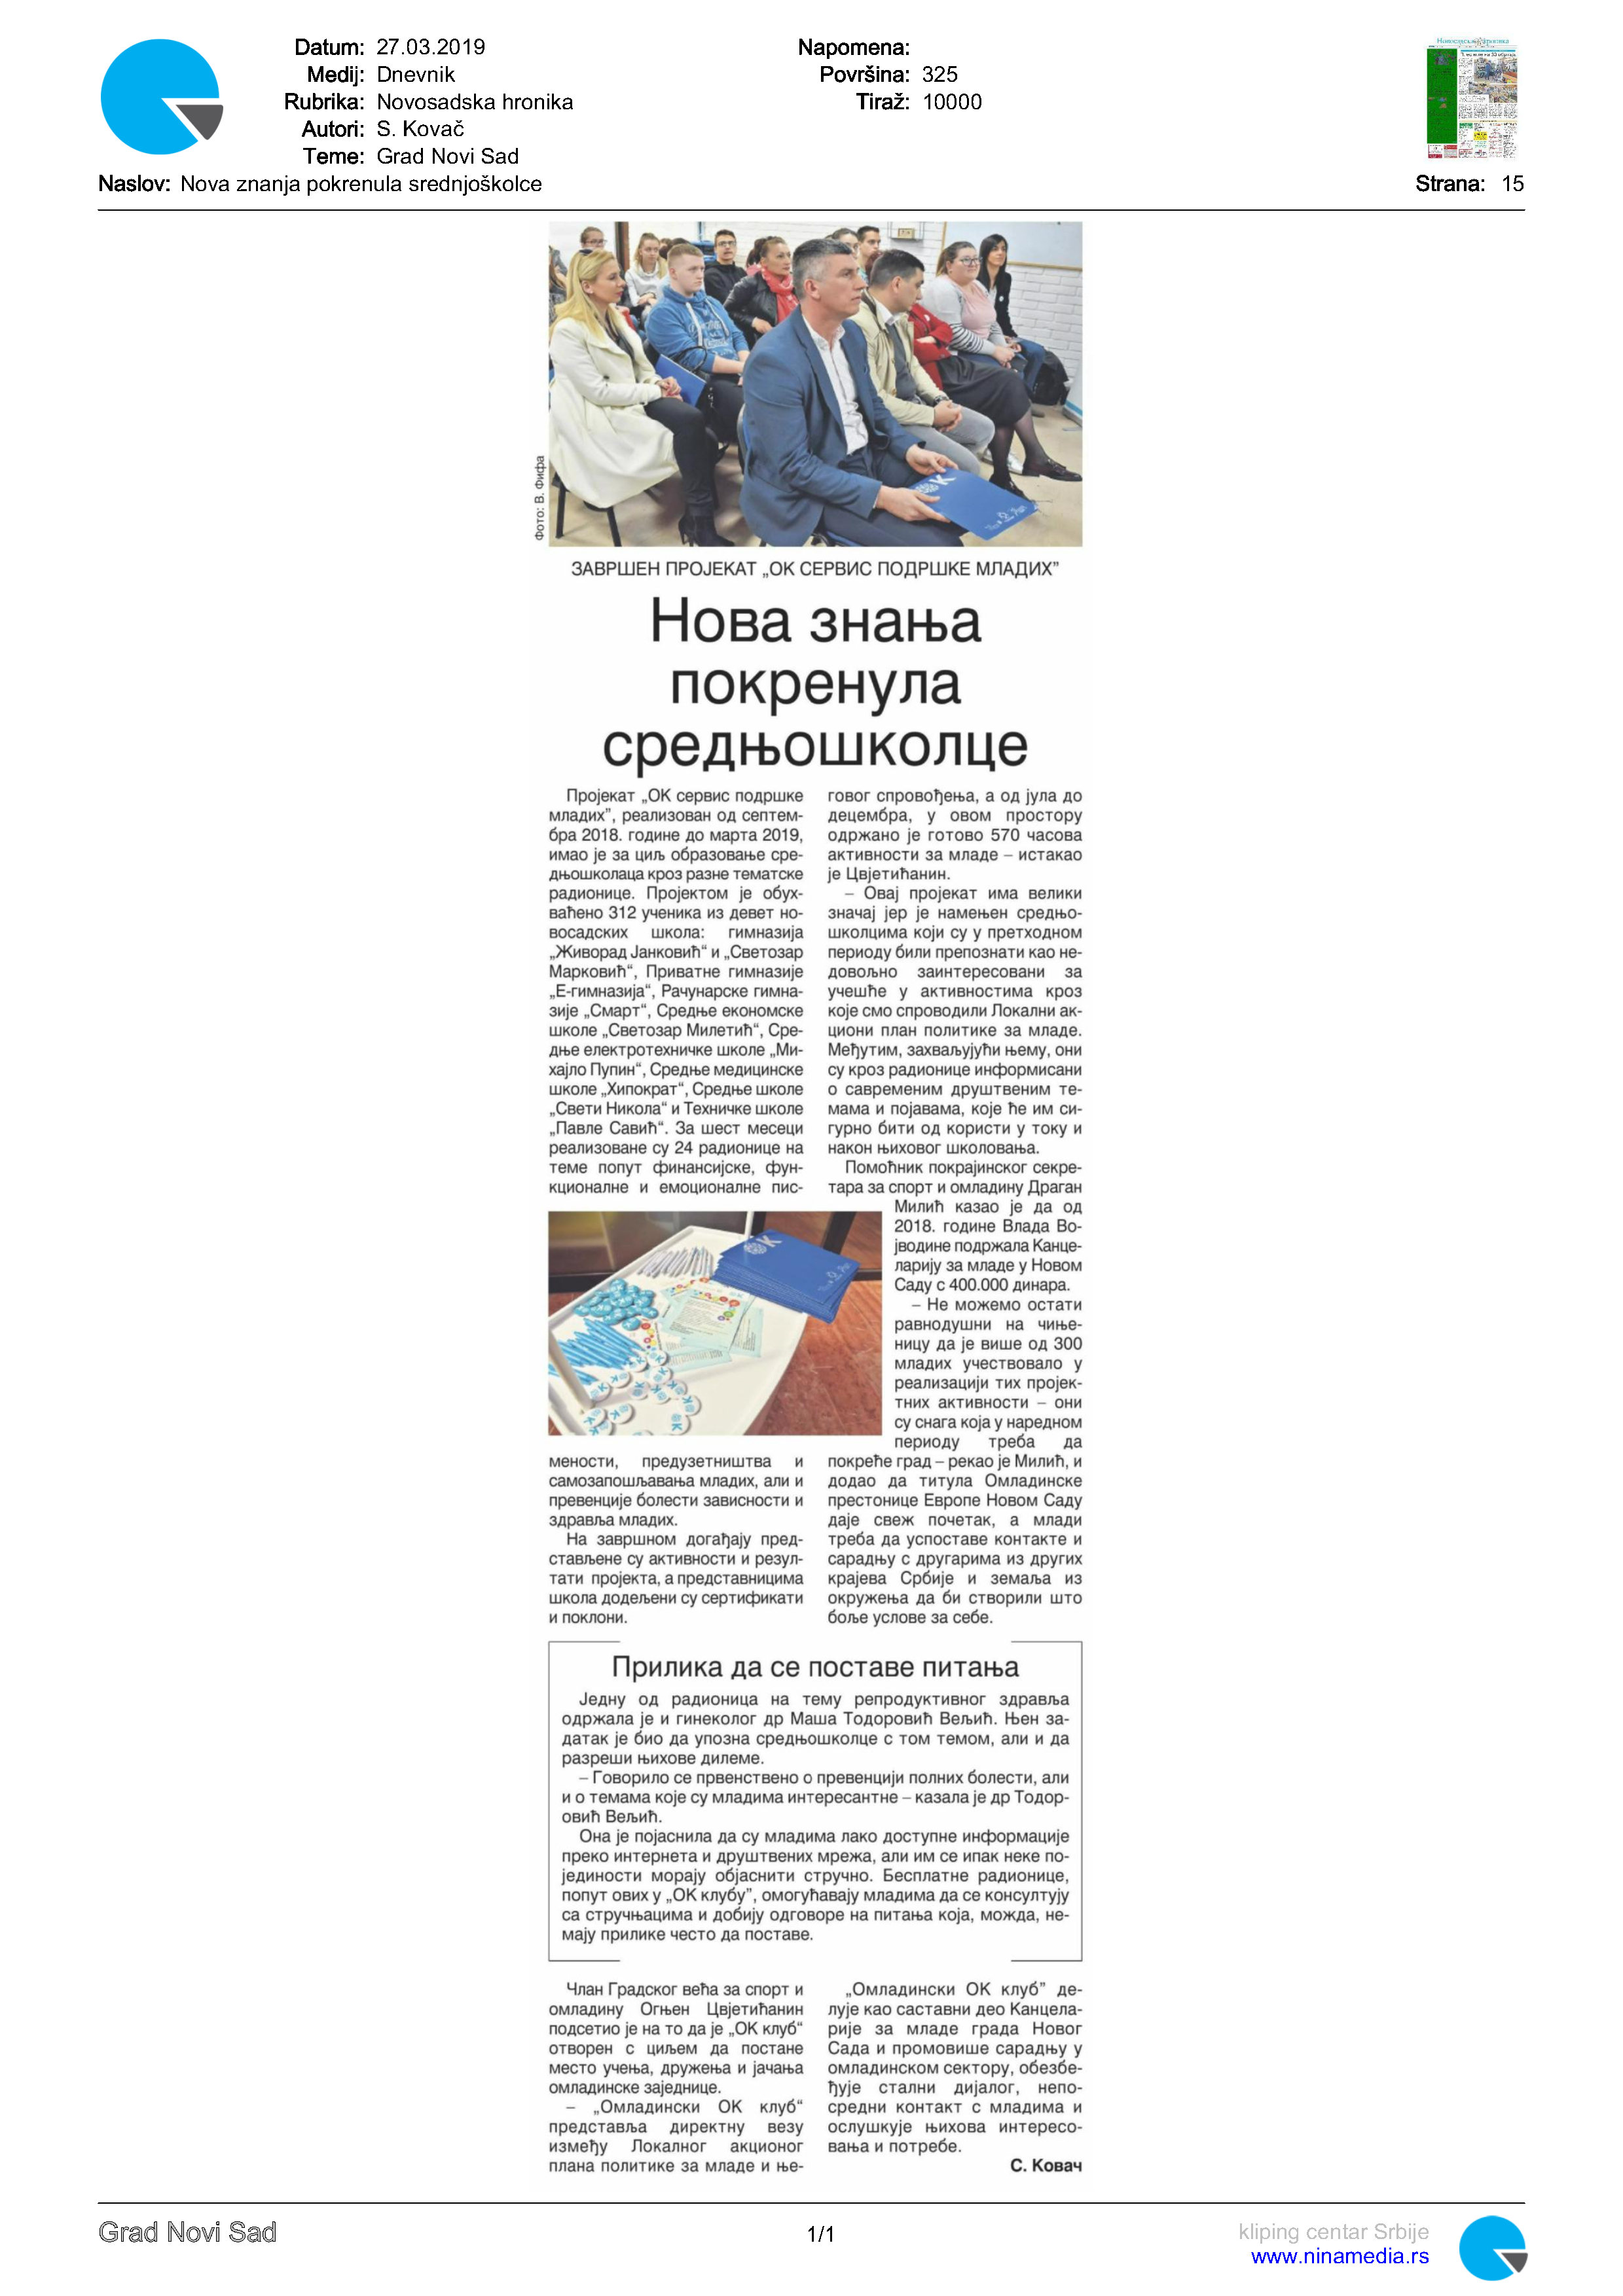 ninamedia-press_clipping_27.03.2019_09-35-31.9665000